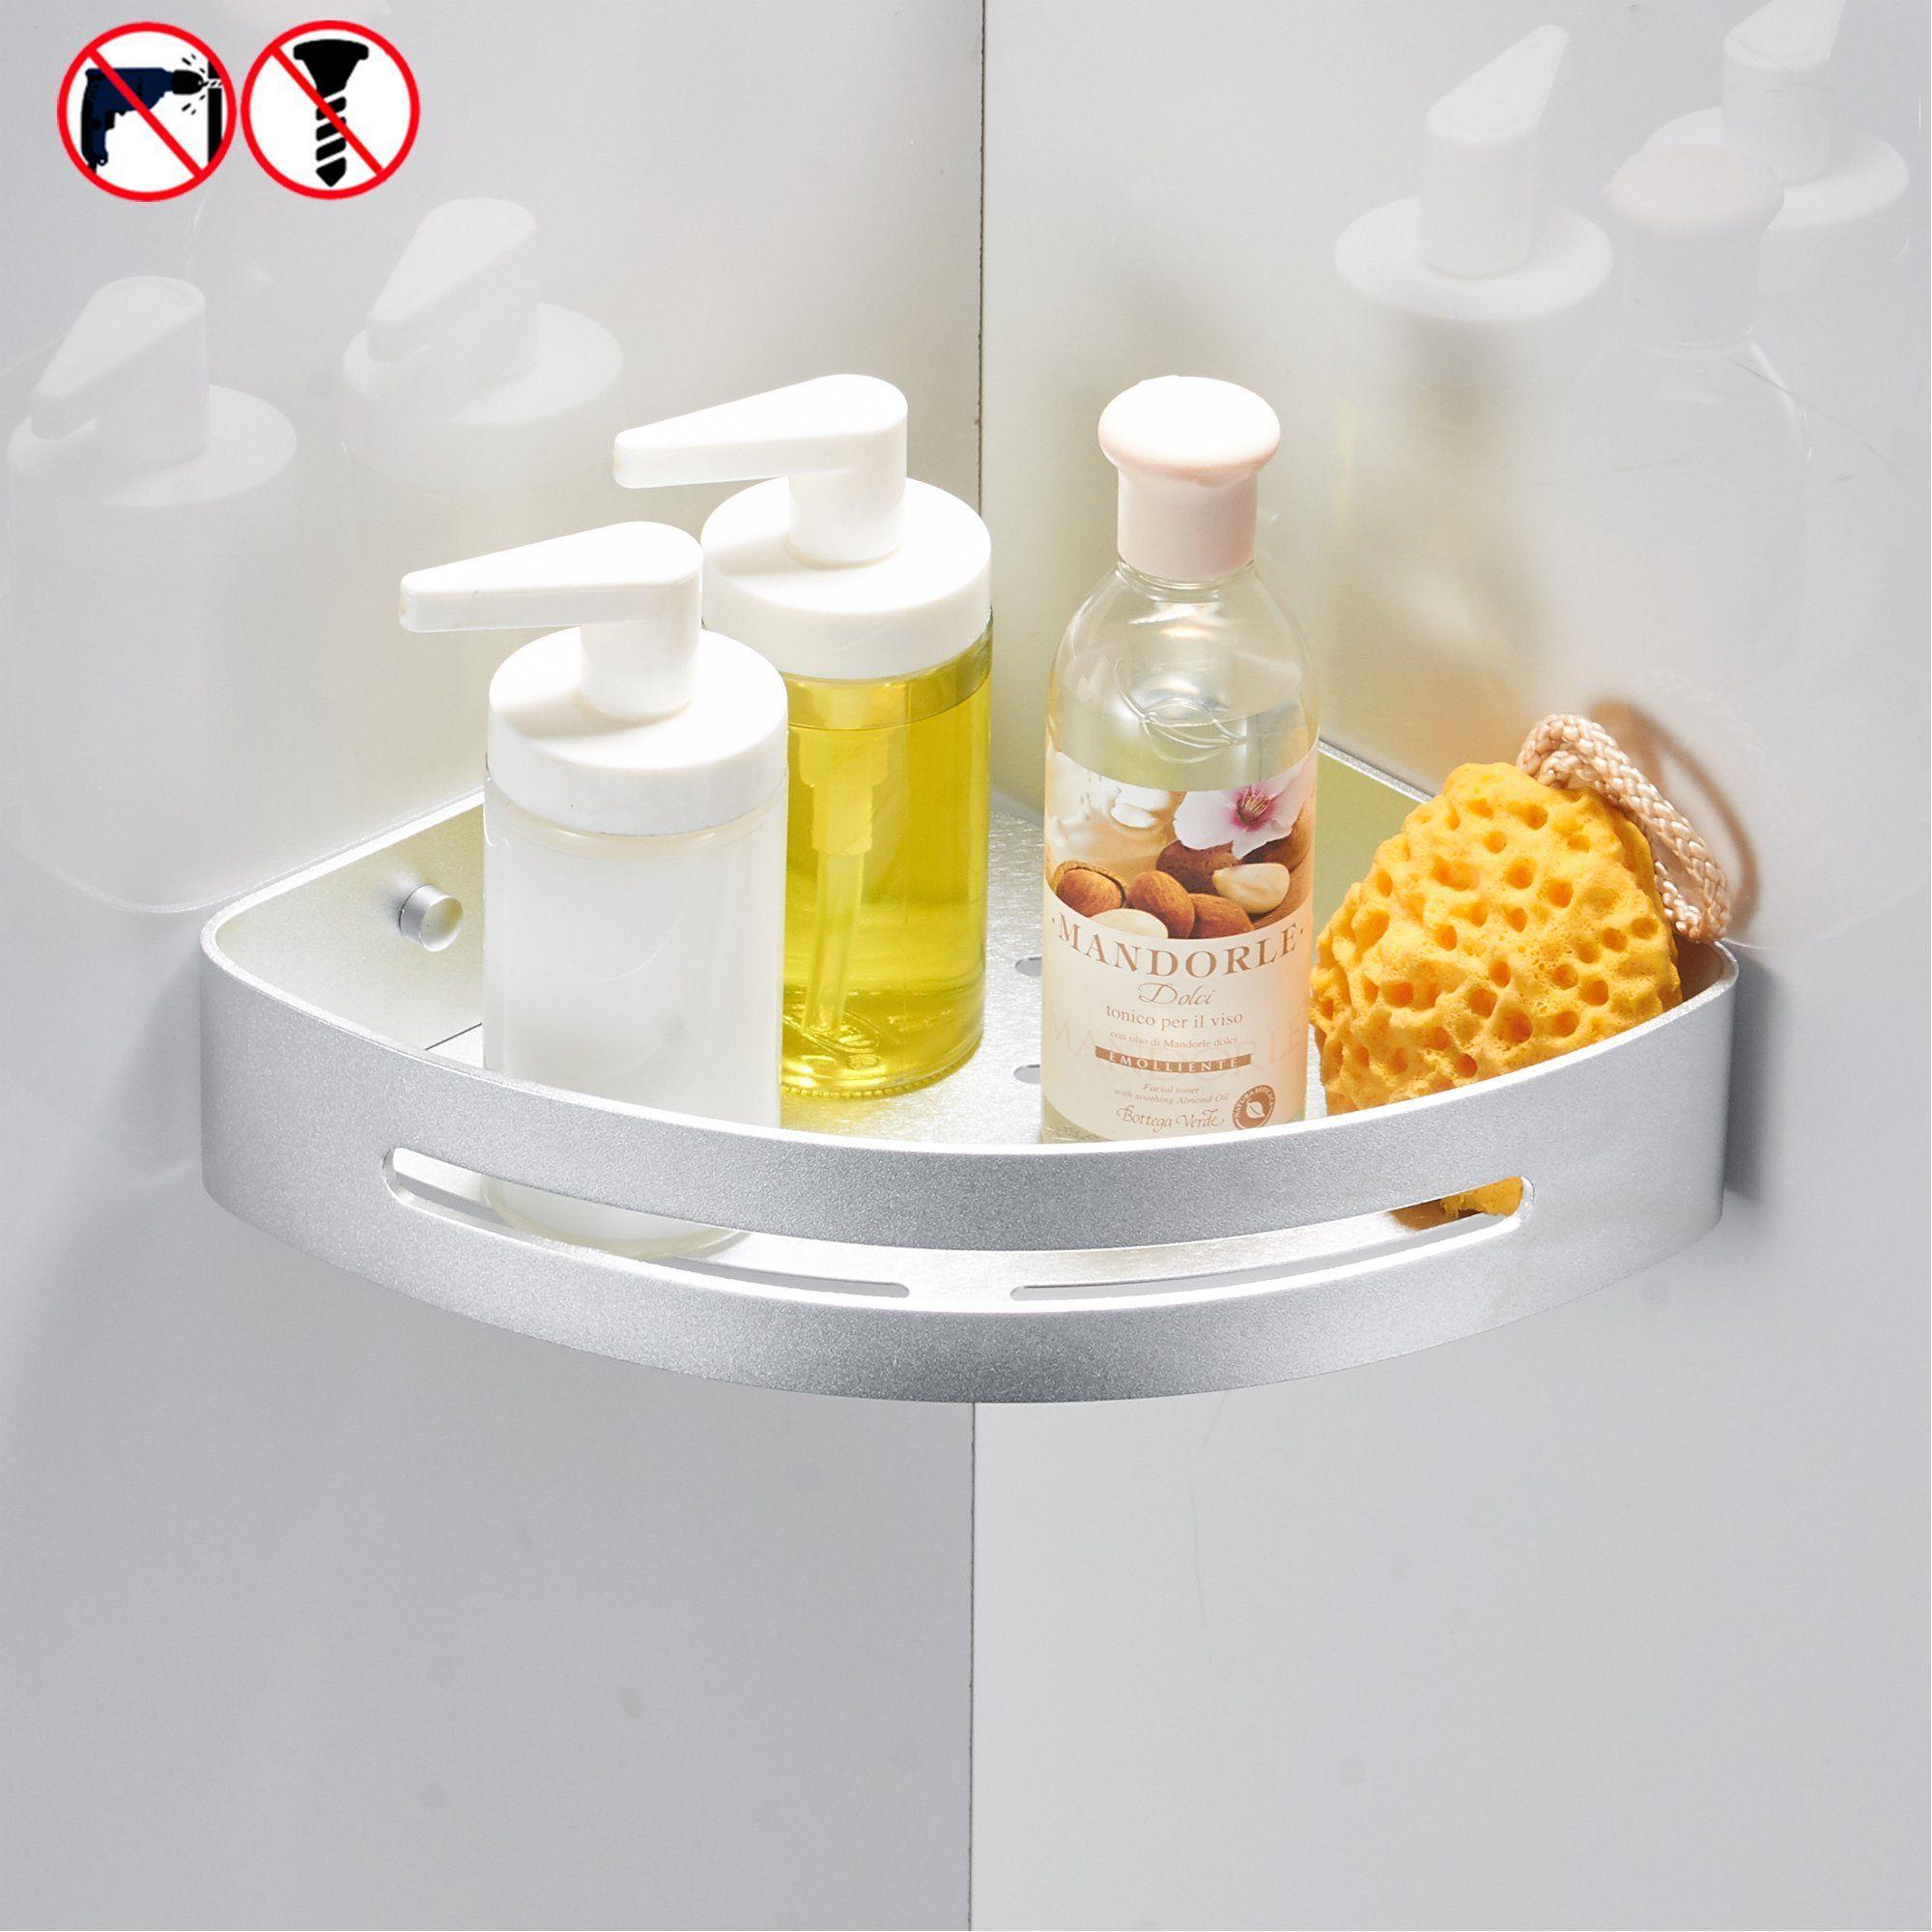 BESy Shower Corner Caddy Bathroom Shower Corner Shelf Self Adhesive